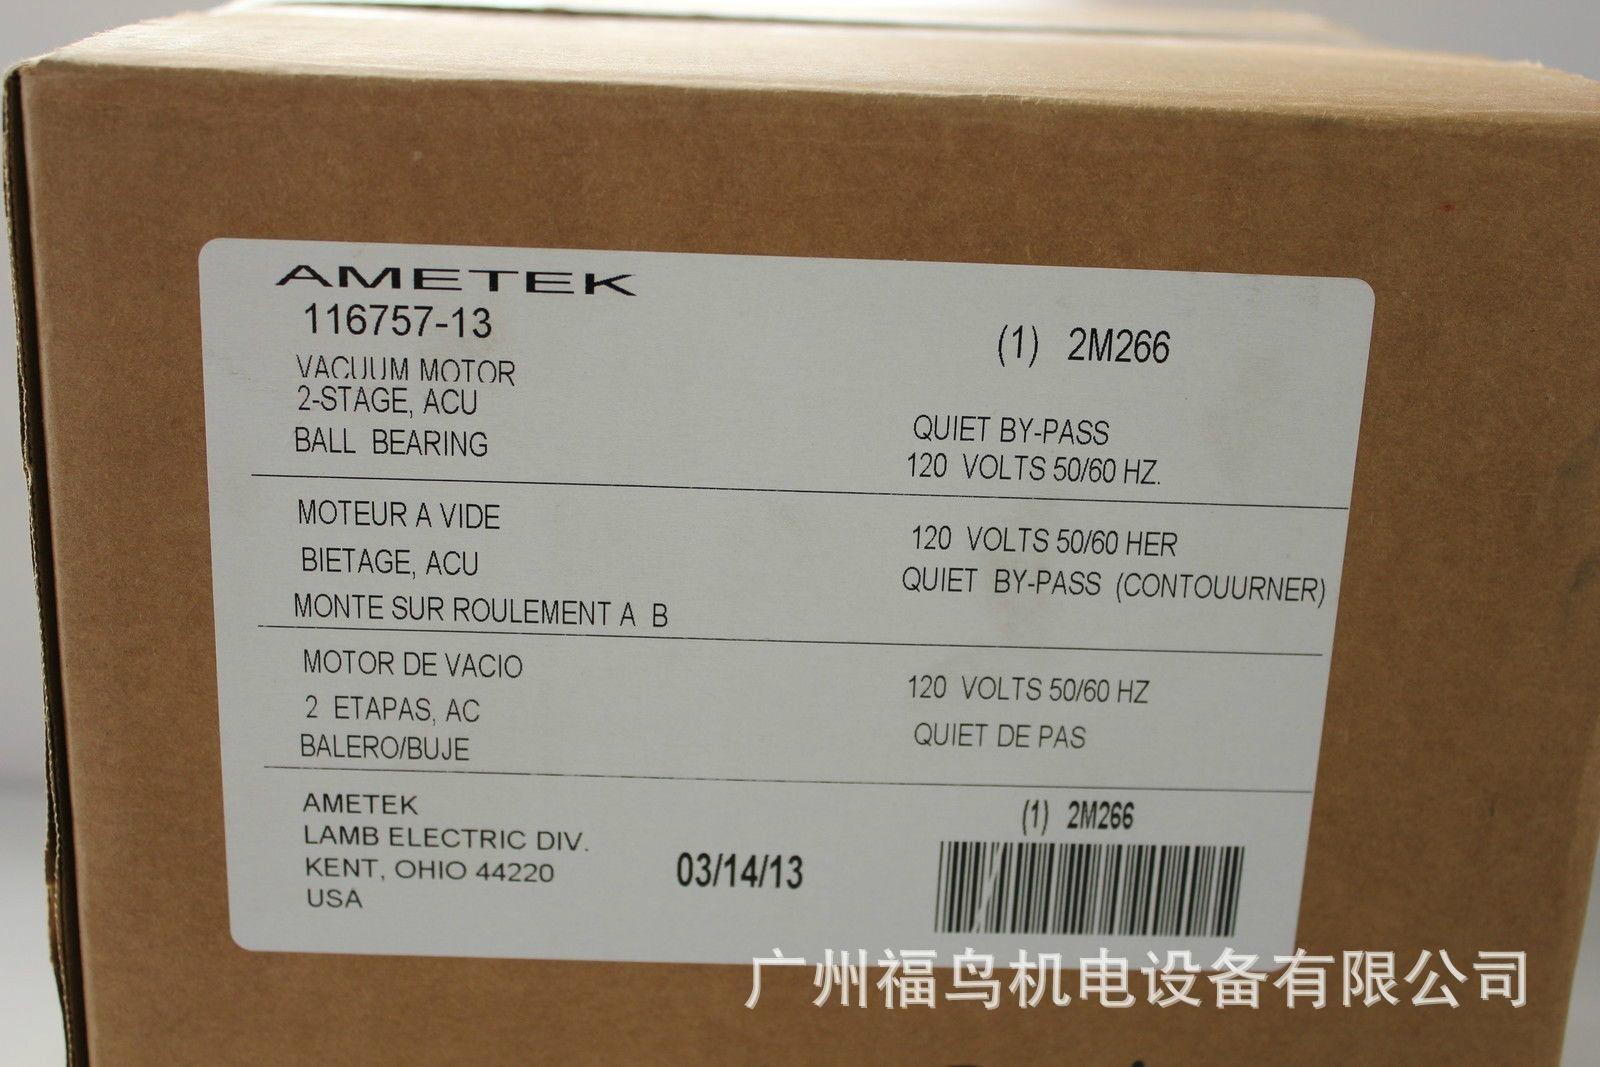 AMETEK LAMB ELECTRIC真空马达, 型号: 116757-13